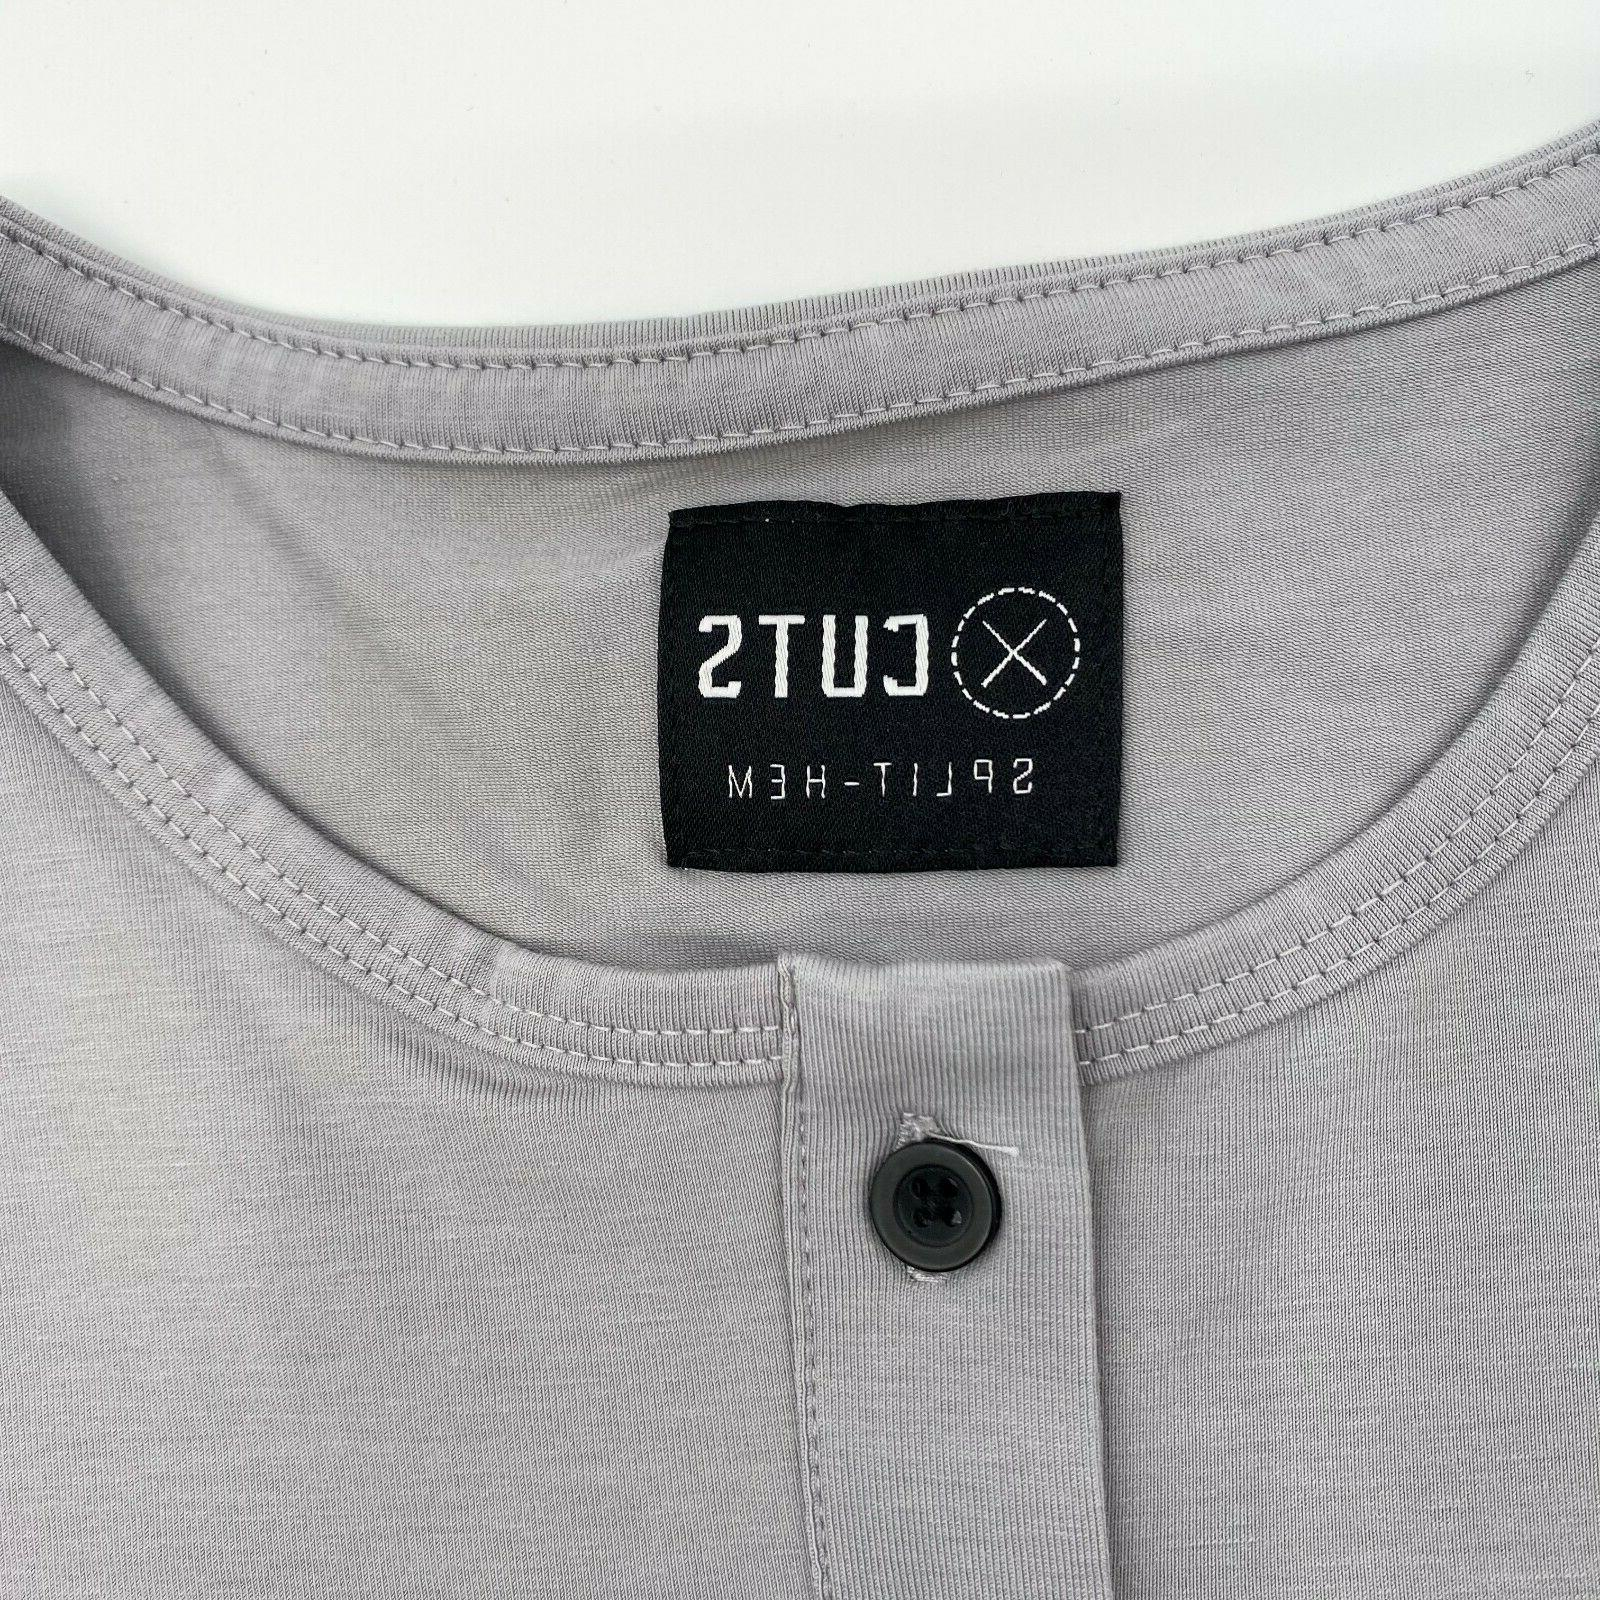 Cuts Men Sleeve T-Shirt Granite Gray M XL